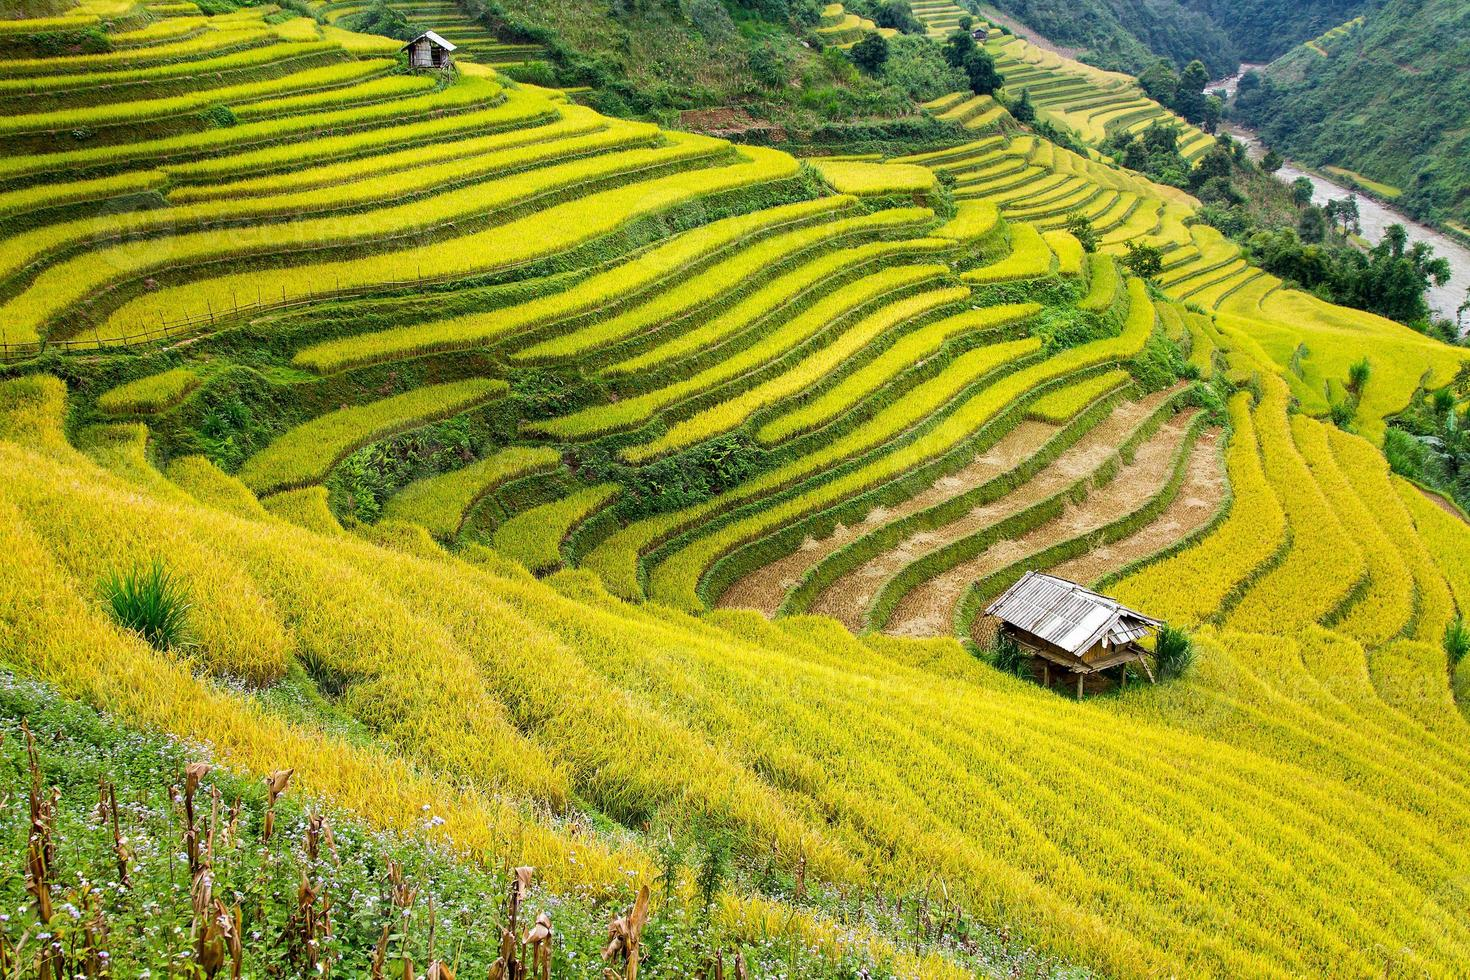 Terraced fields in the northern mountainous region of Vietnam photo